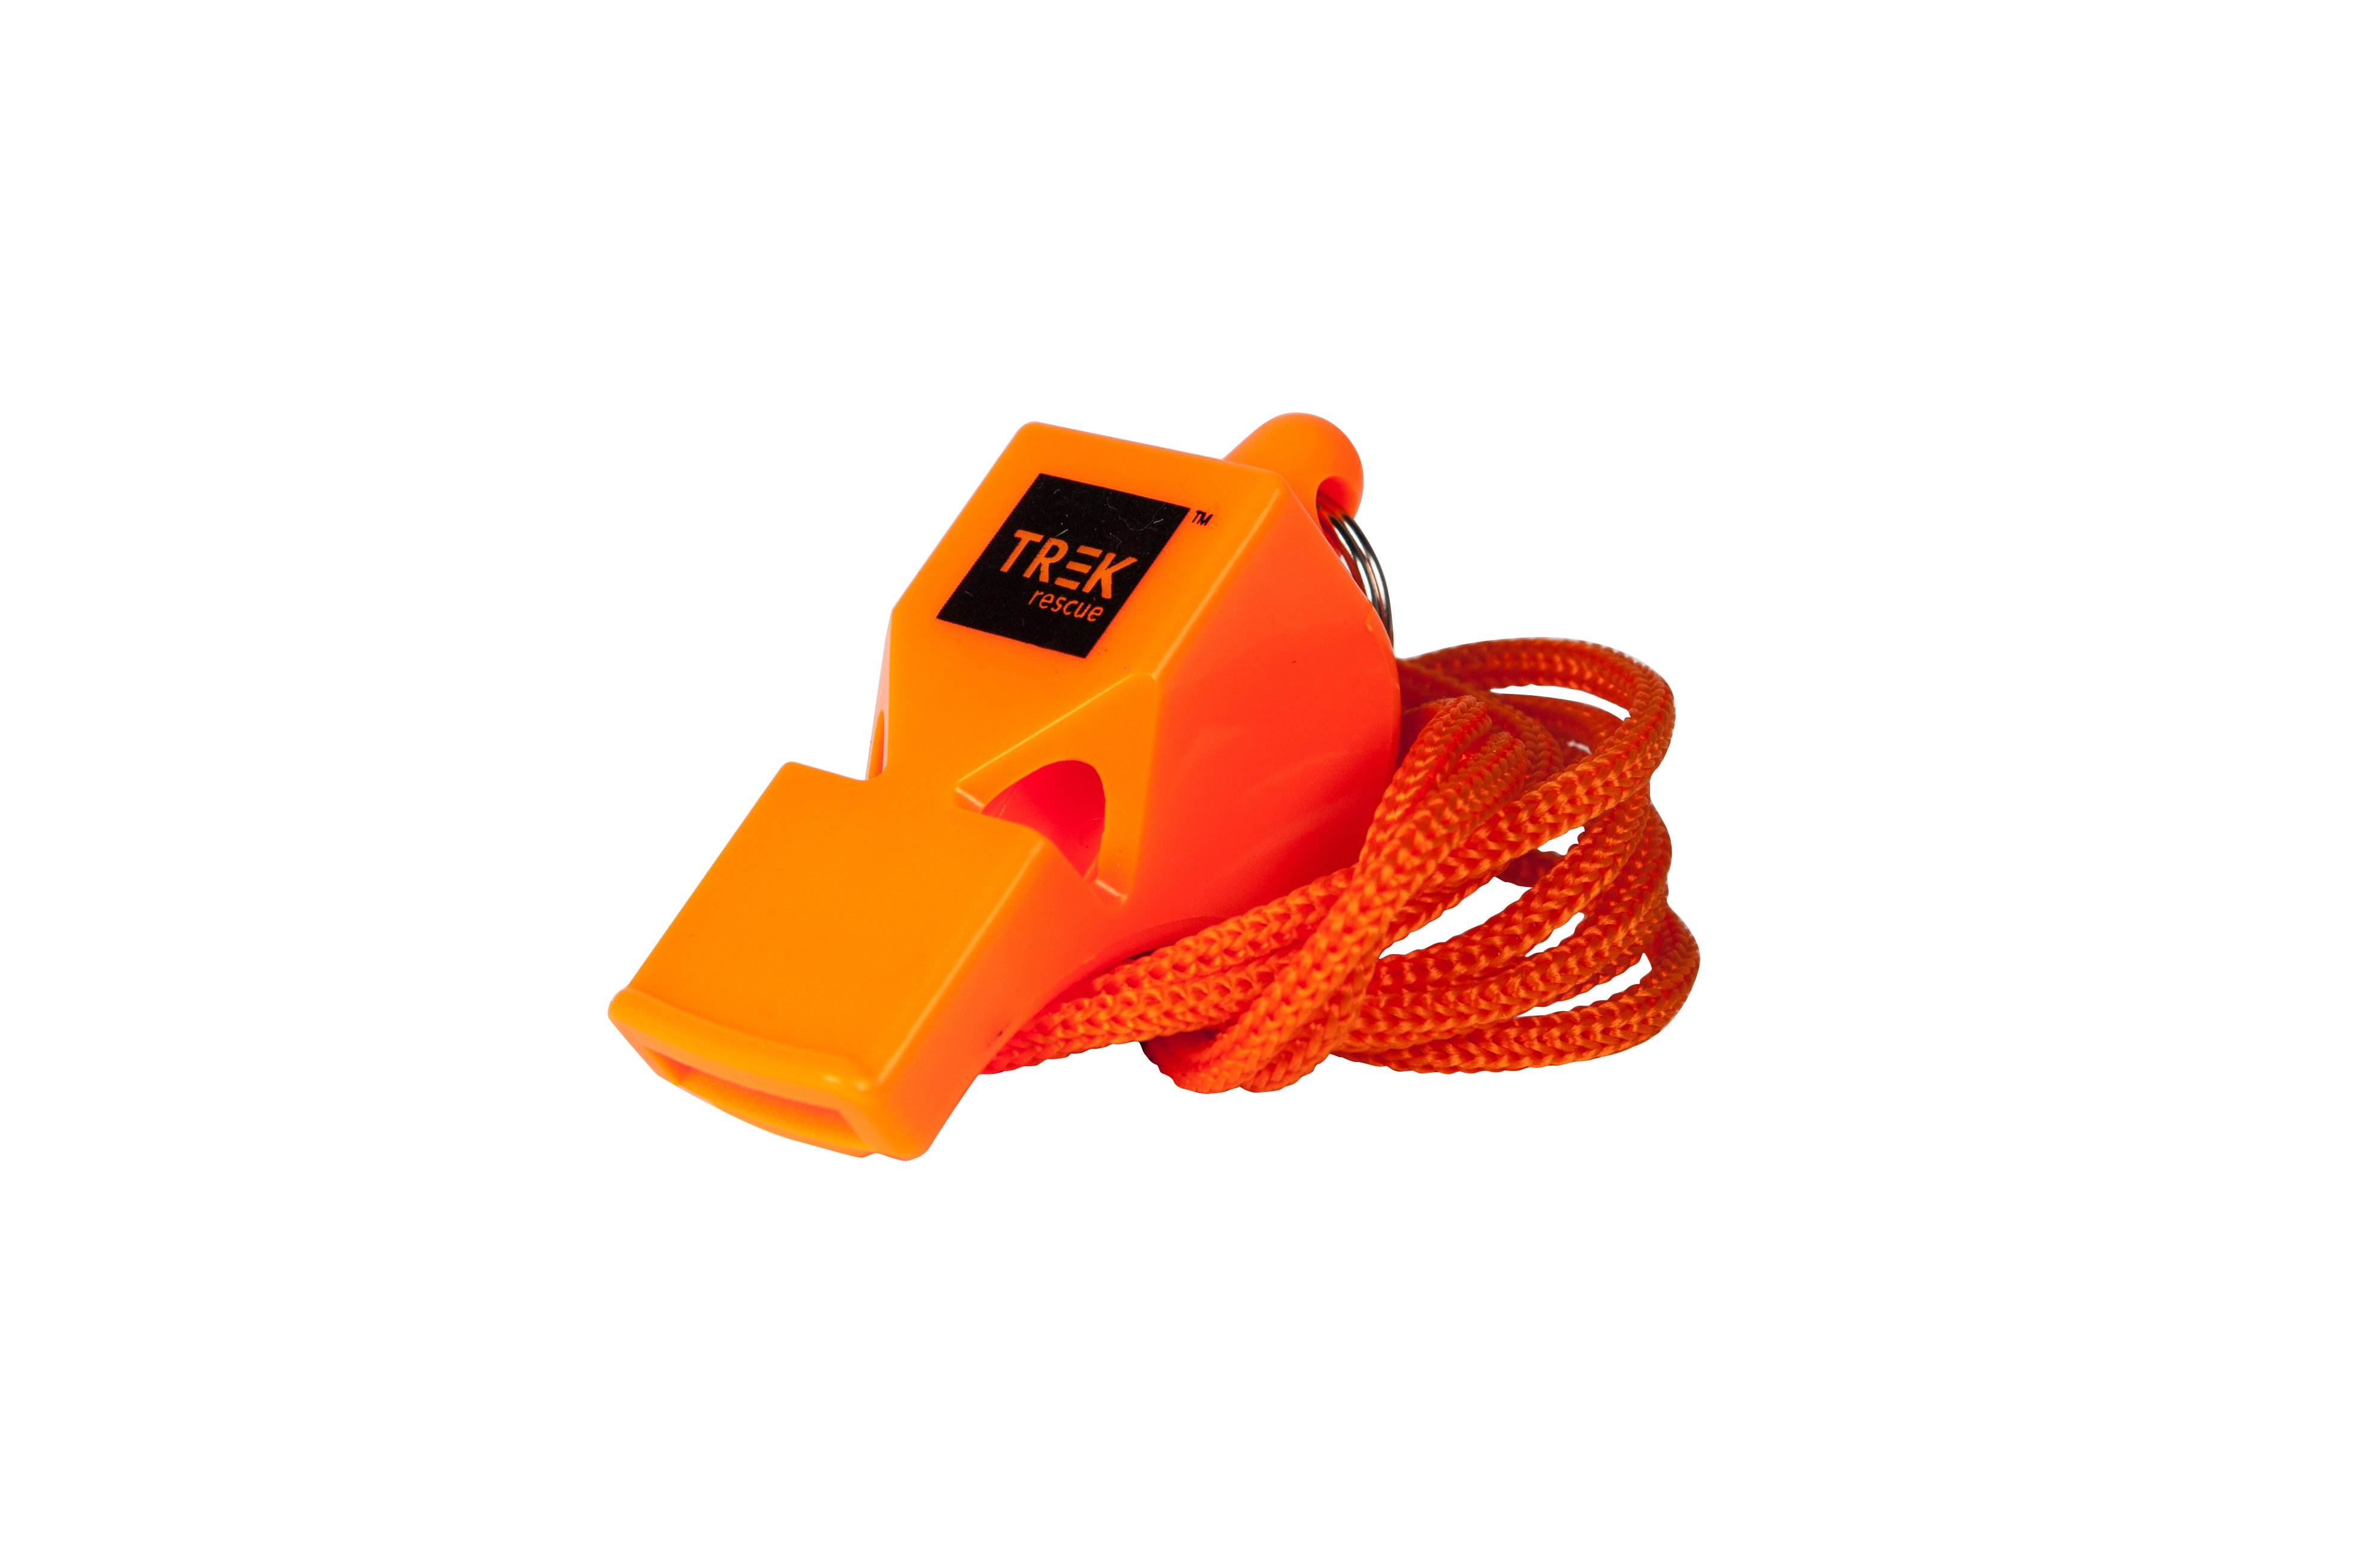 Pealess Emergency Whistle